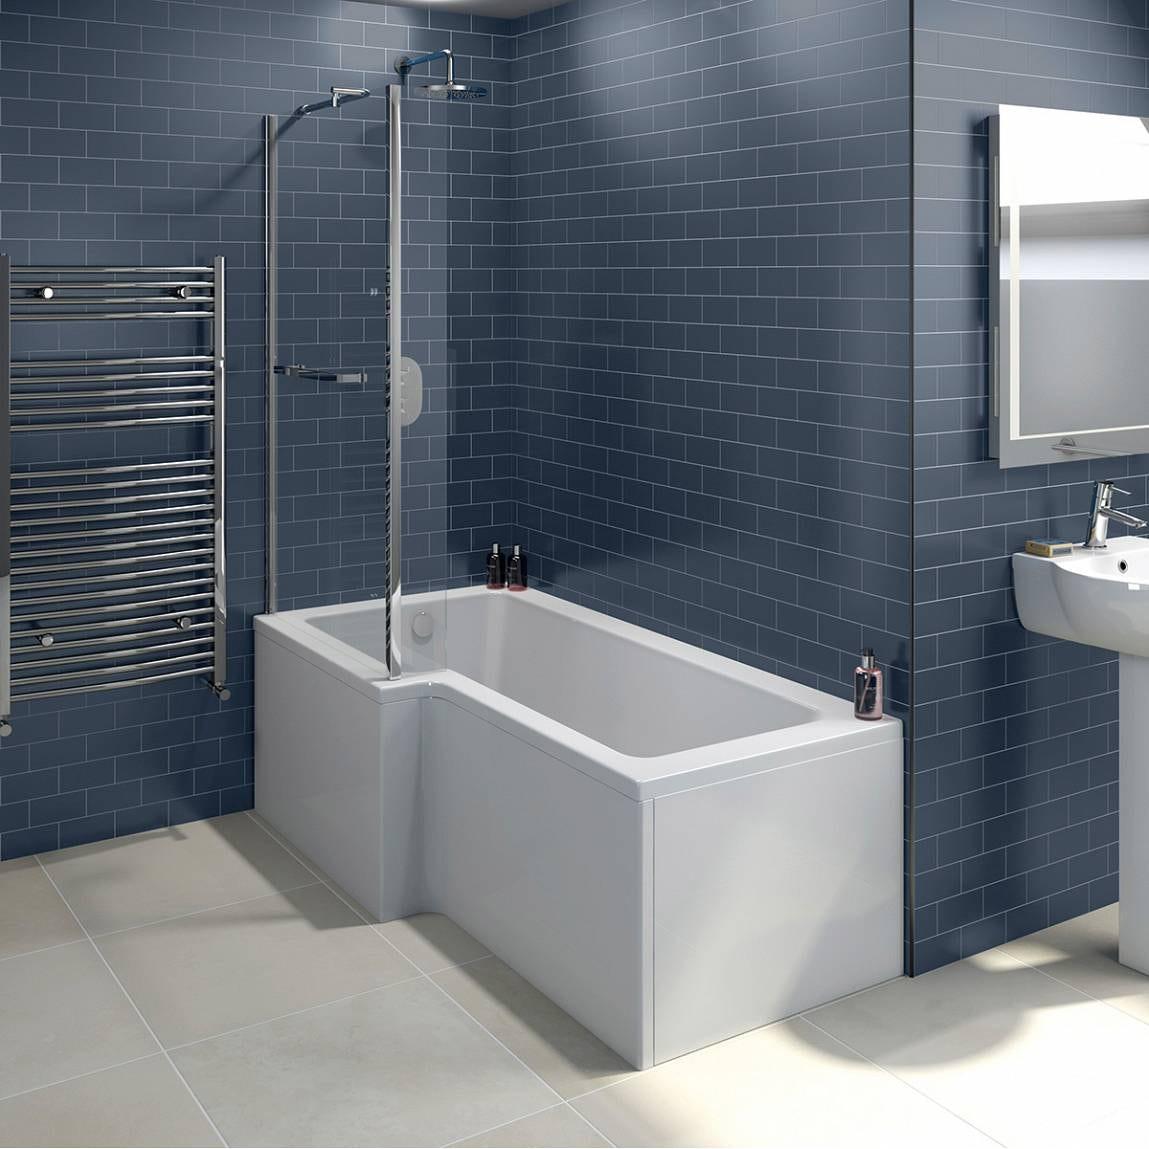 Boston Shower Bath 1500 x 850 LH inc. Screen & Towel Rail